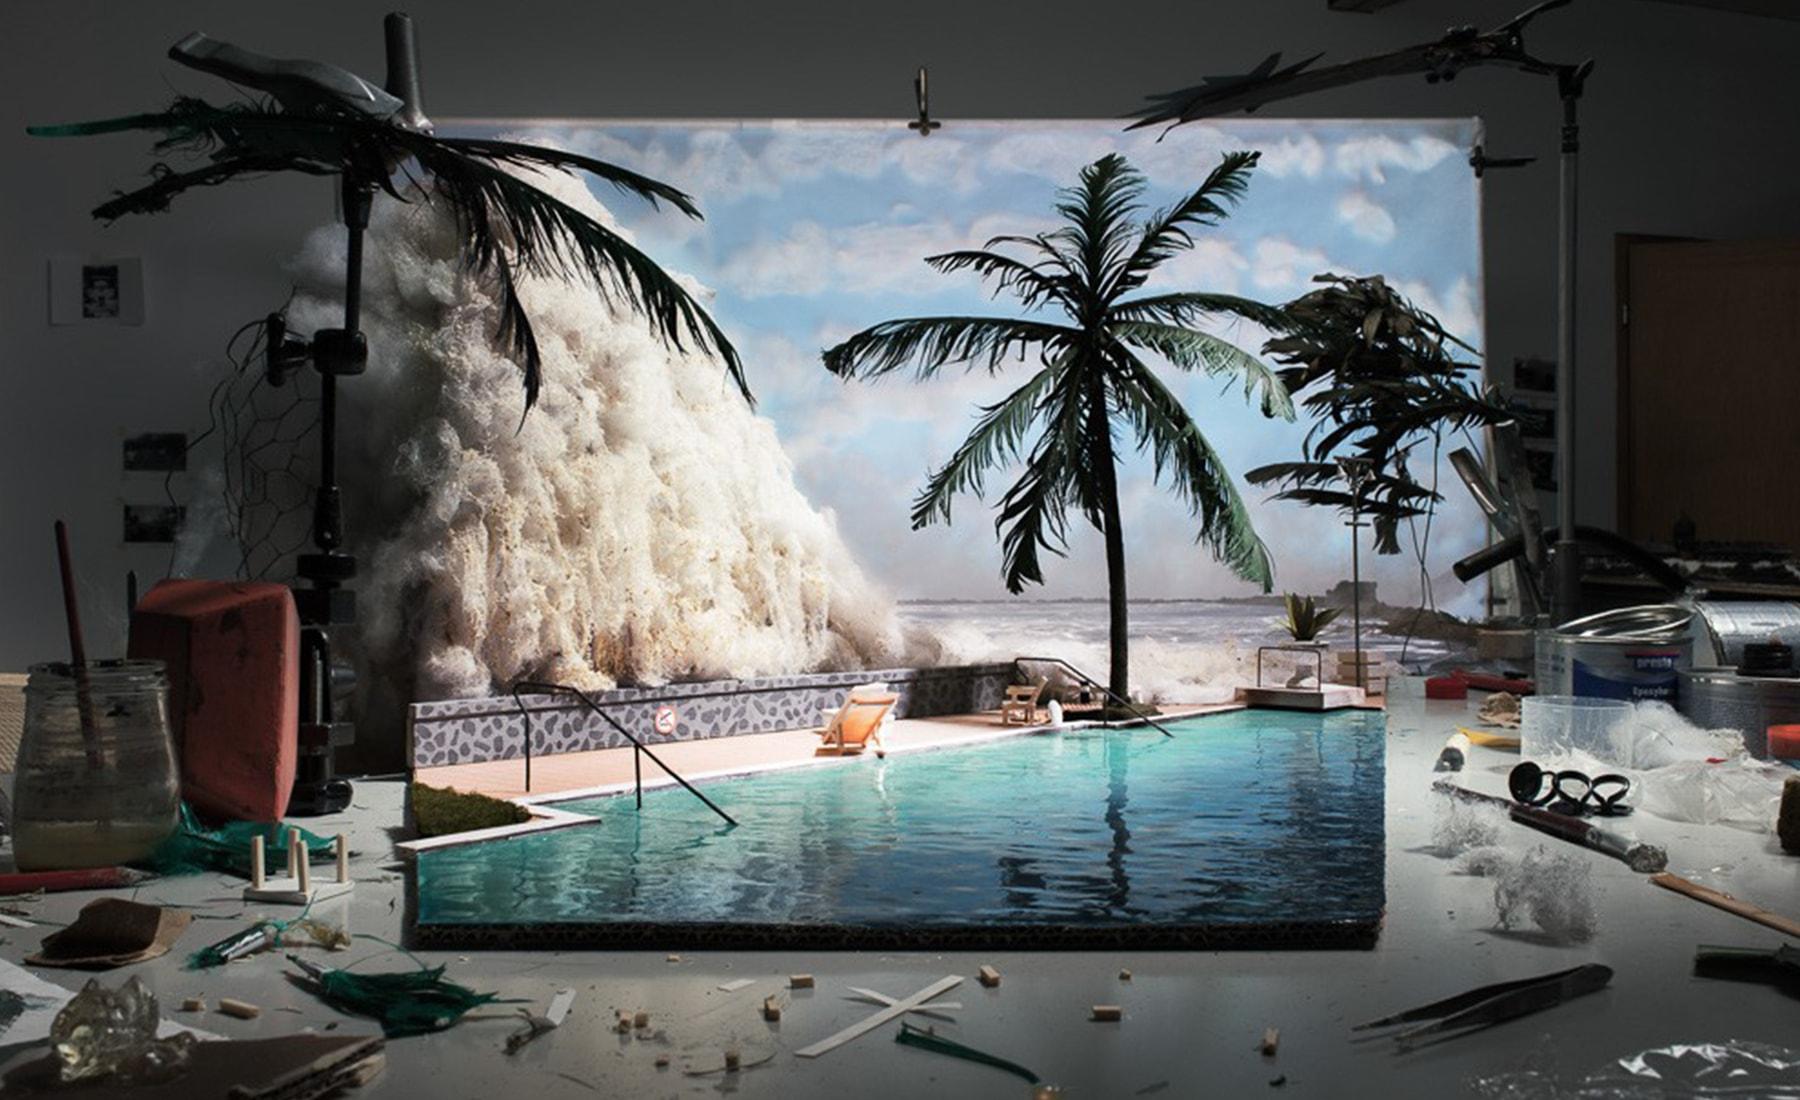 Fotó: Cortis & Sonderegger: Making of 'Tsunami' (by Unknown tourist, 2014), 2015 © Thames and Hudson / Cortis & Sonderegger